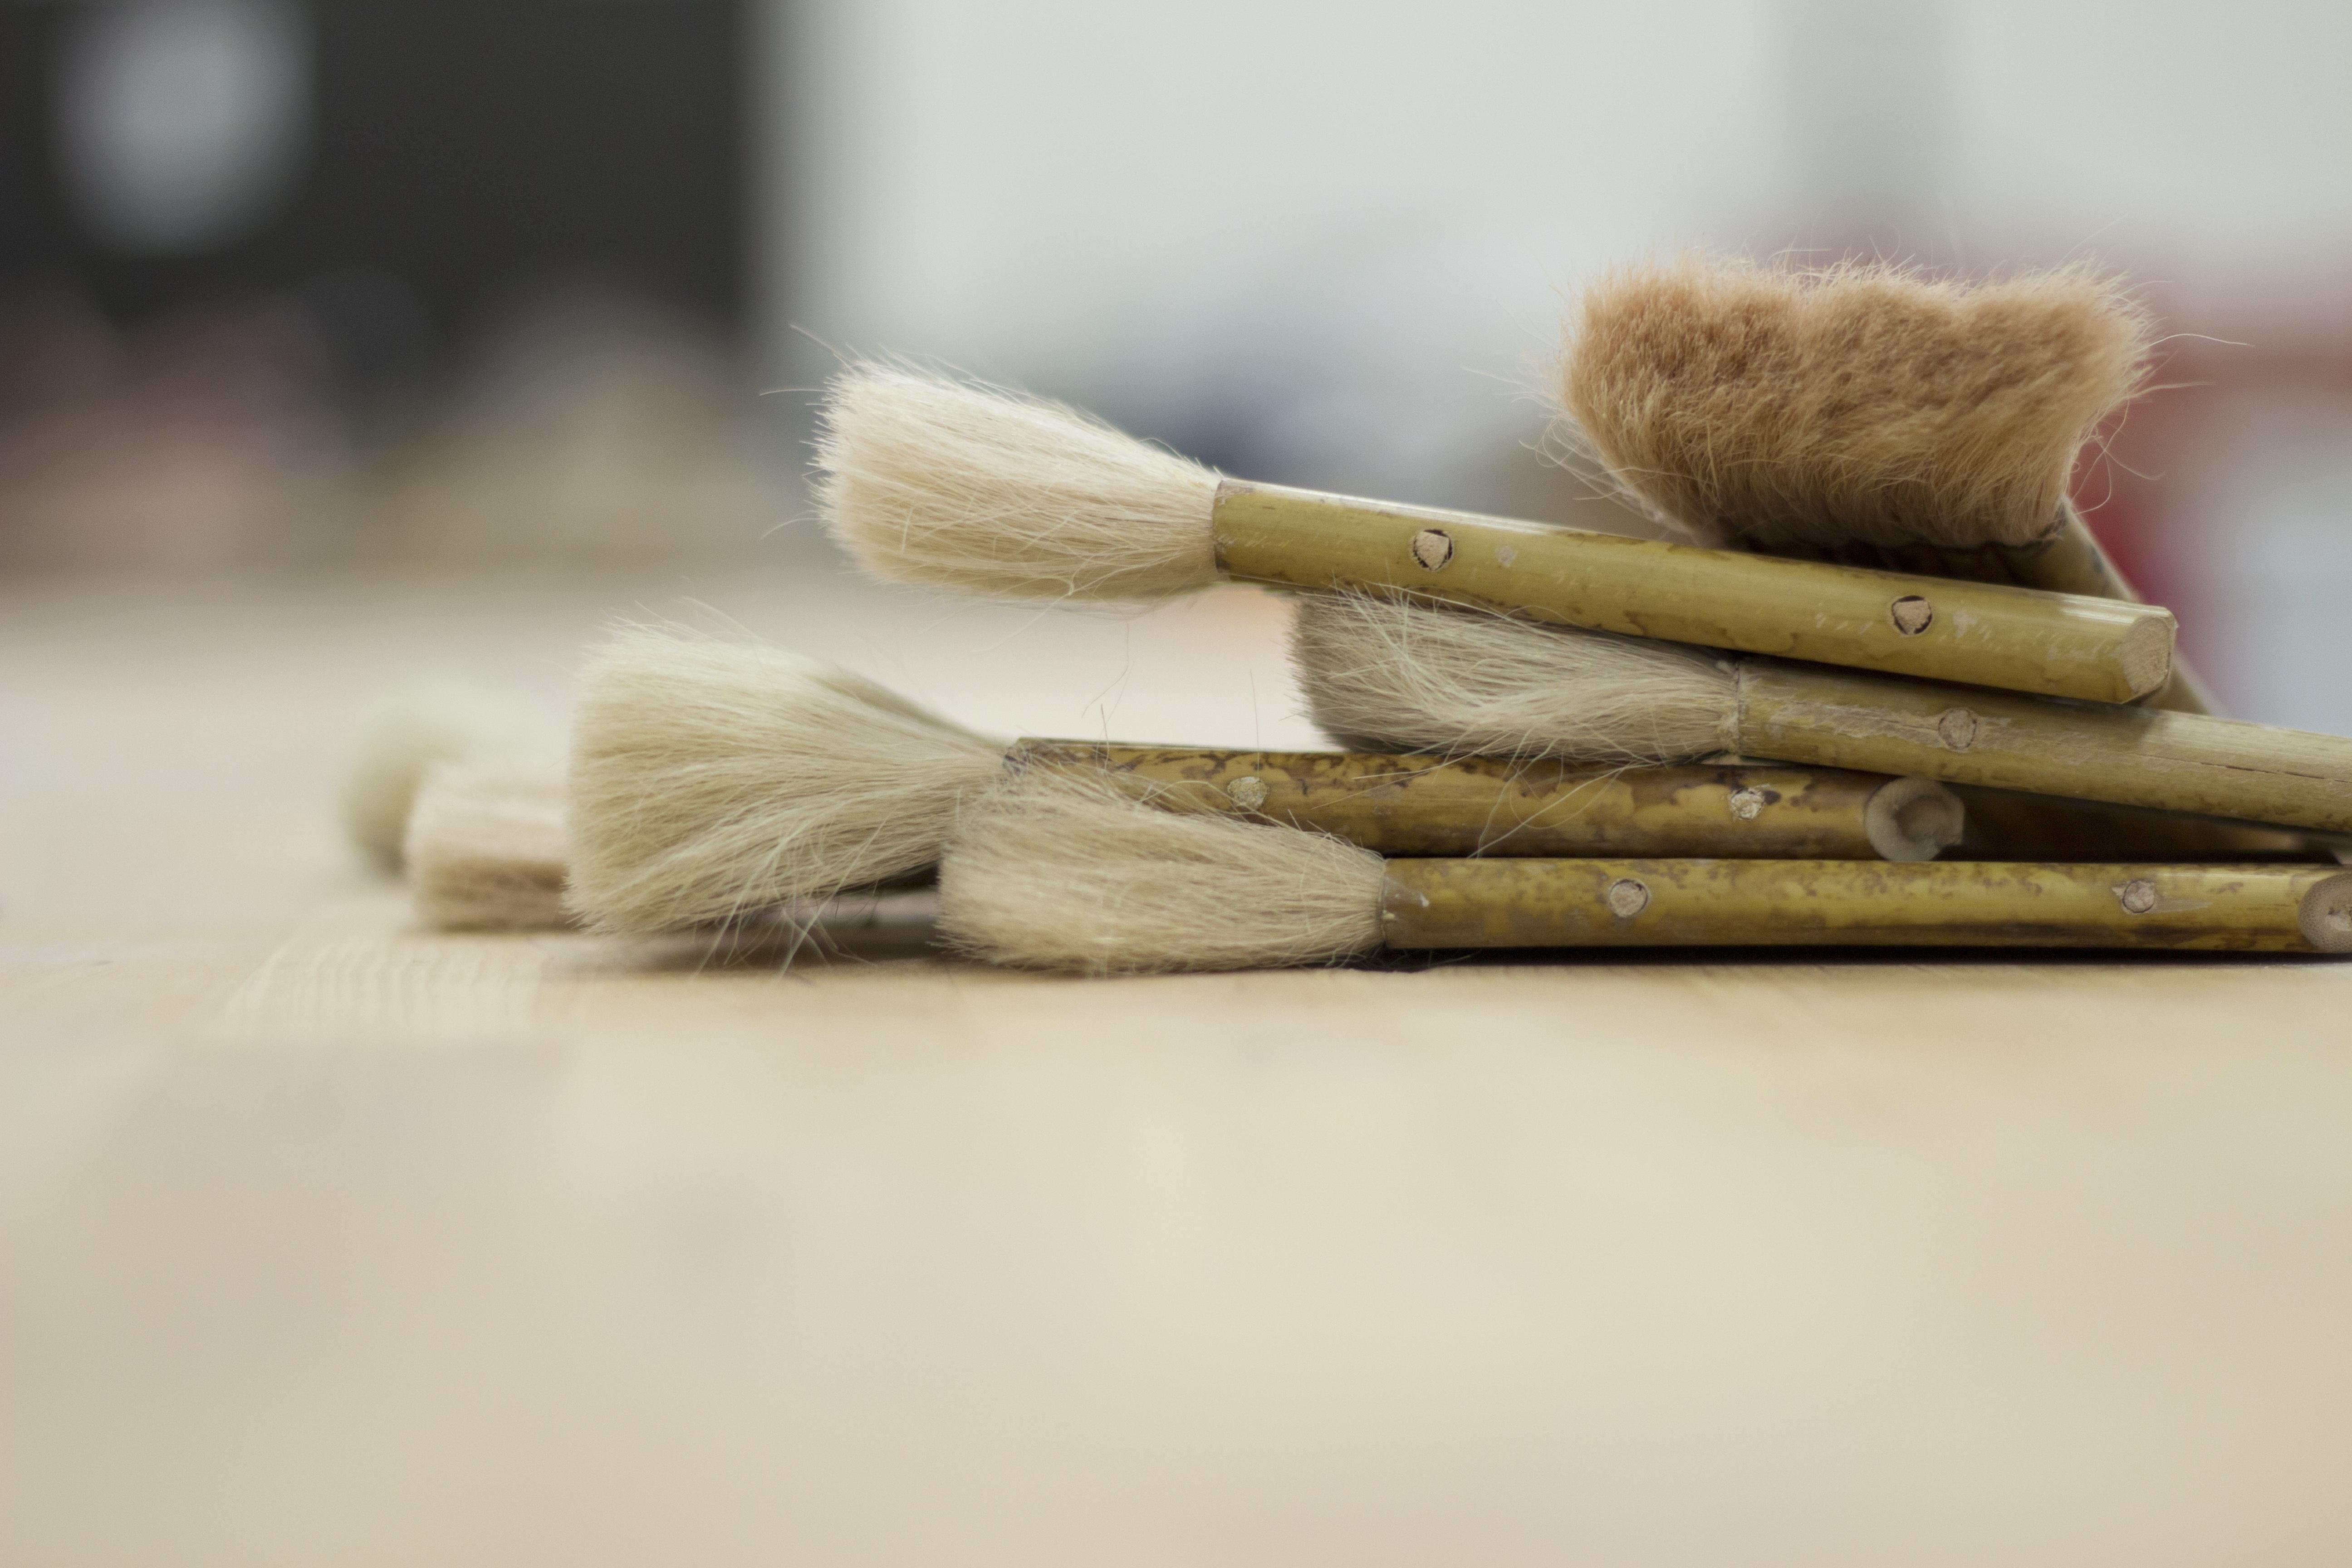 The Painter, Art, Artist, Brush, Paint, HQ Photo